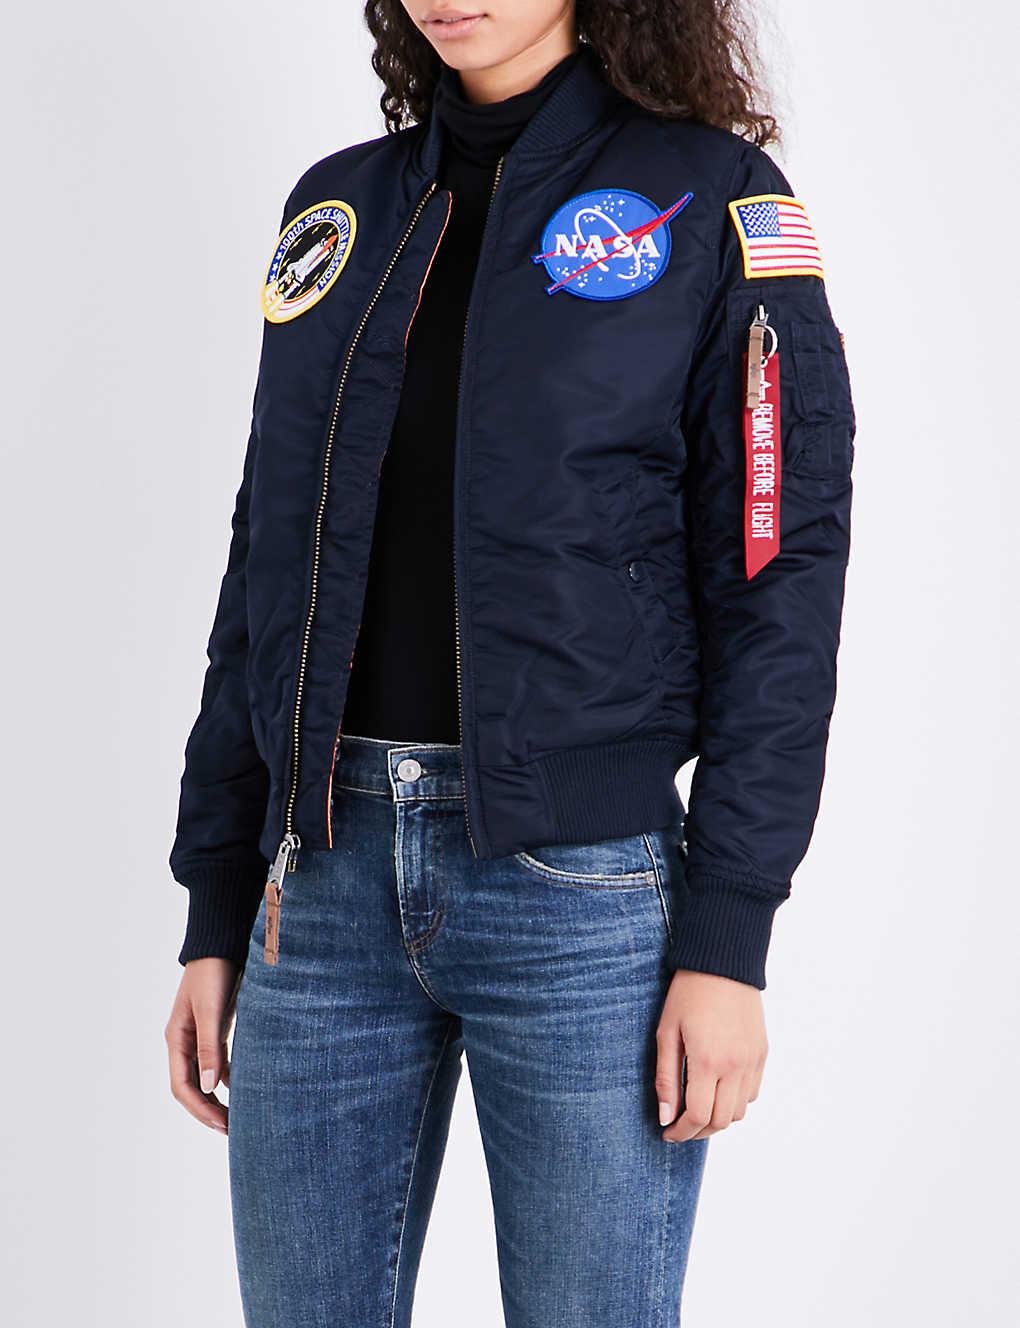 9de1e11c0883c3 ALPHA INDUSTRIES - NASA MA-1 shell flight jacket